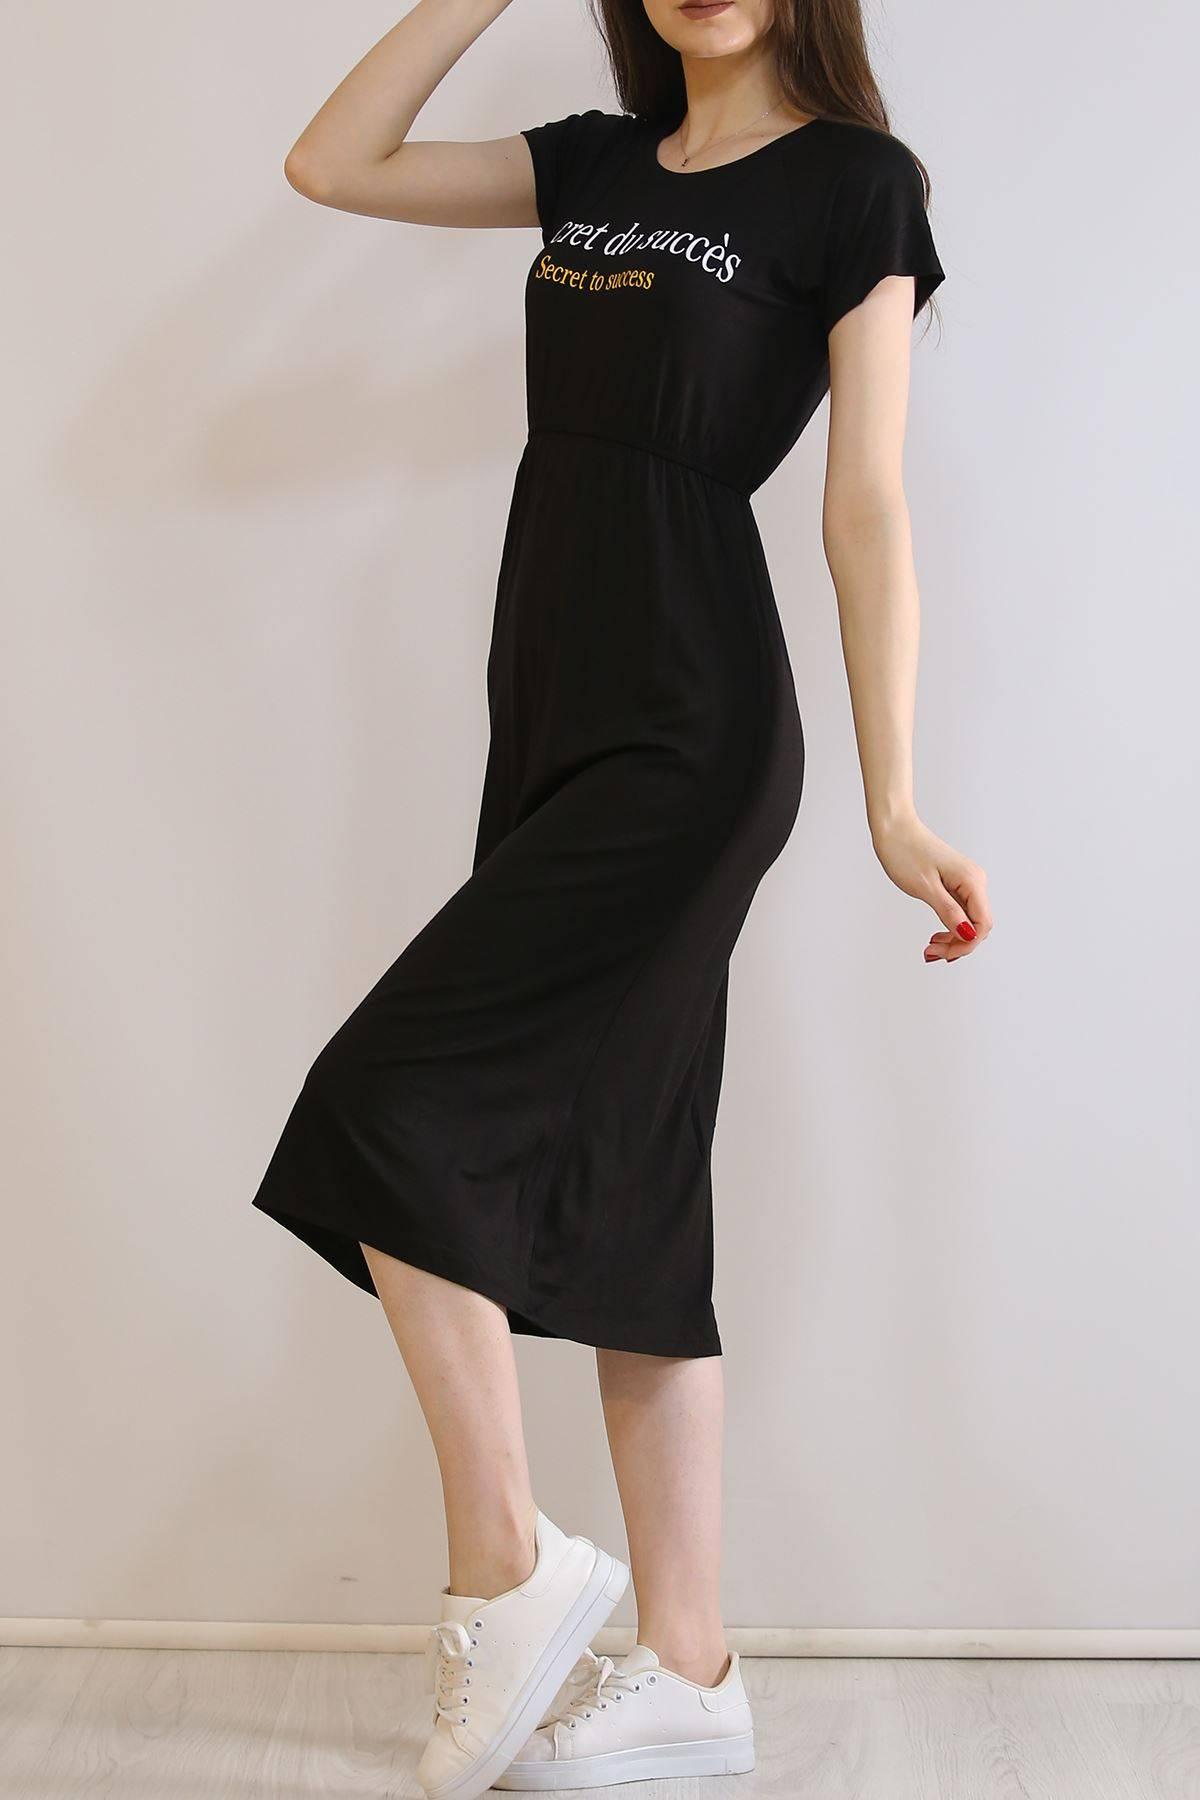 Beli Lastikli Viscon Elbise Siyah - 19349.200.